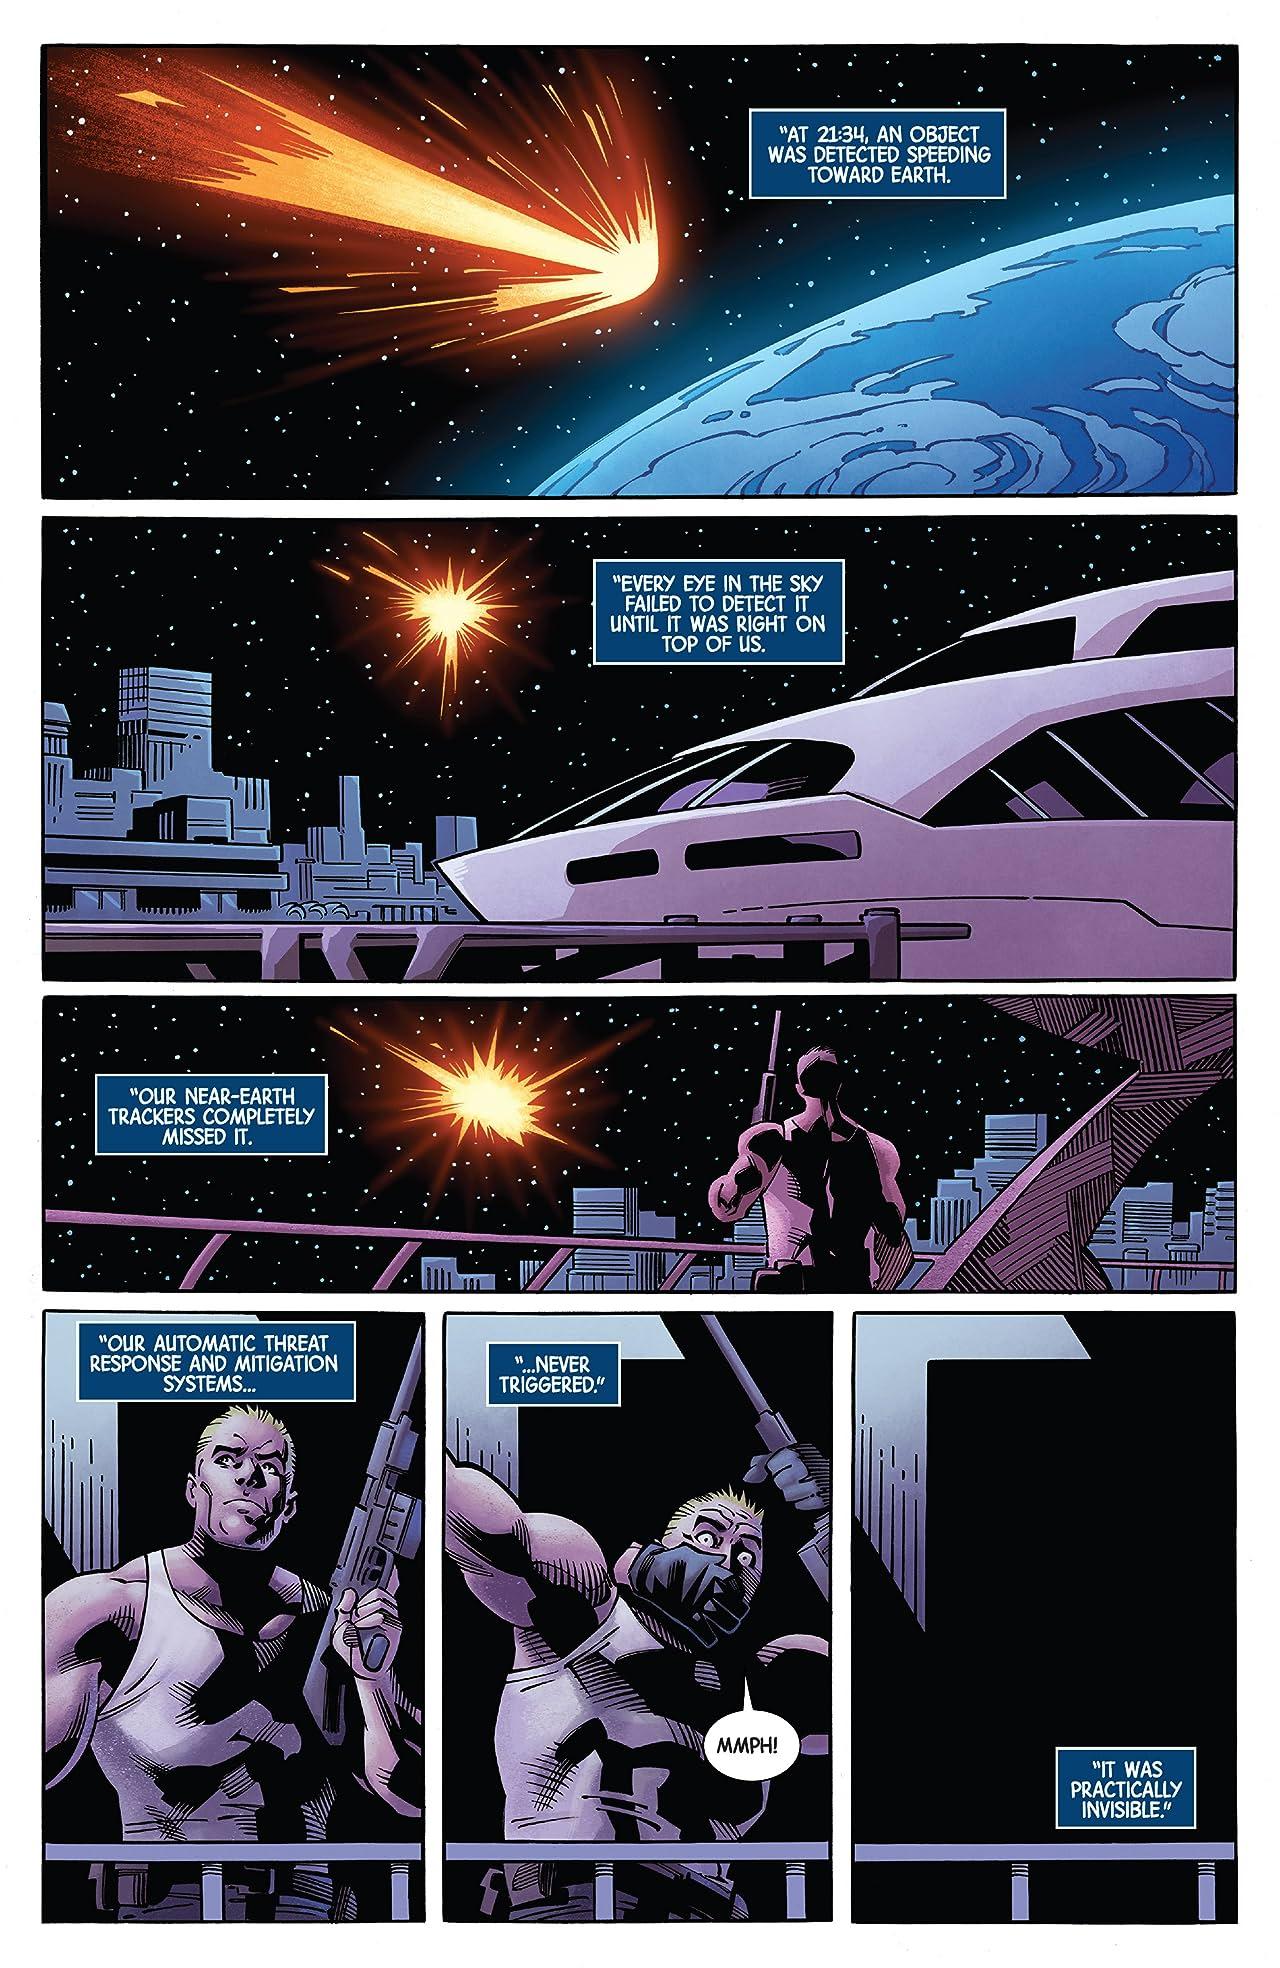 All-New Wolverine Vol. 4: Immune